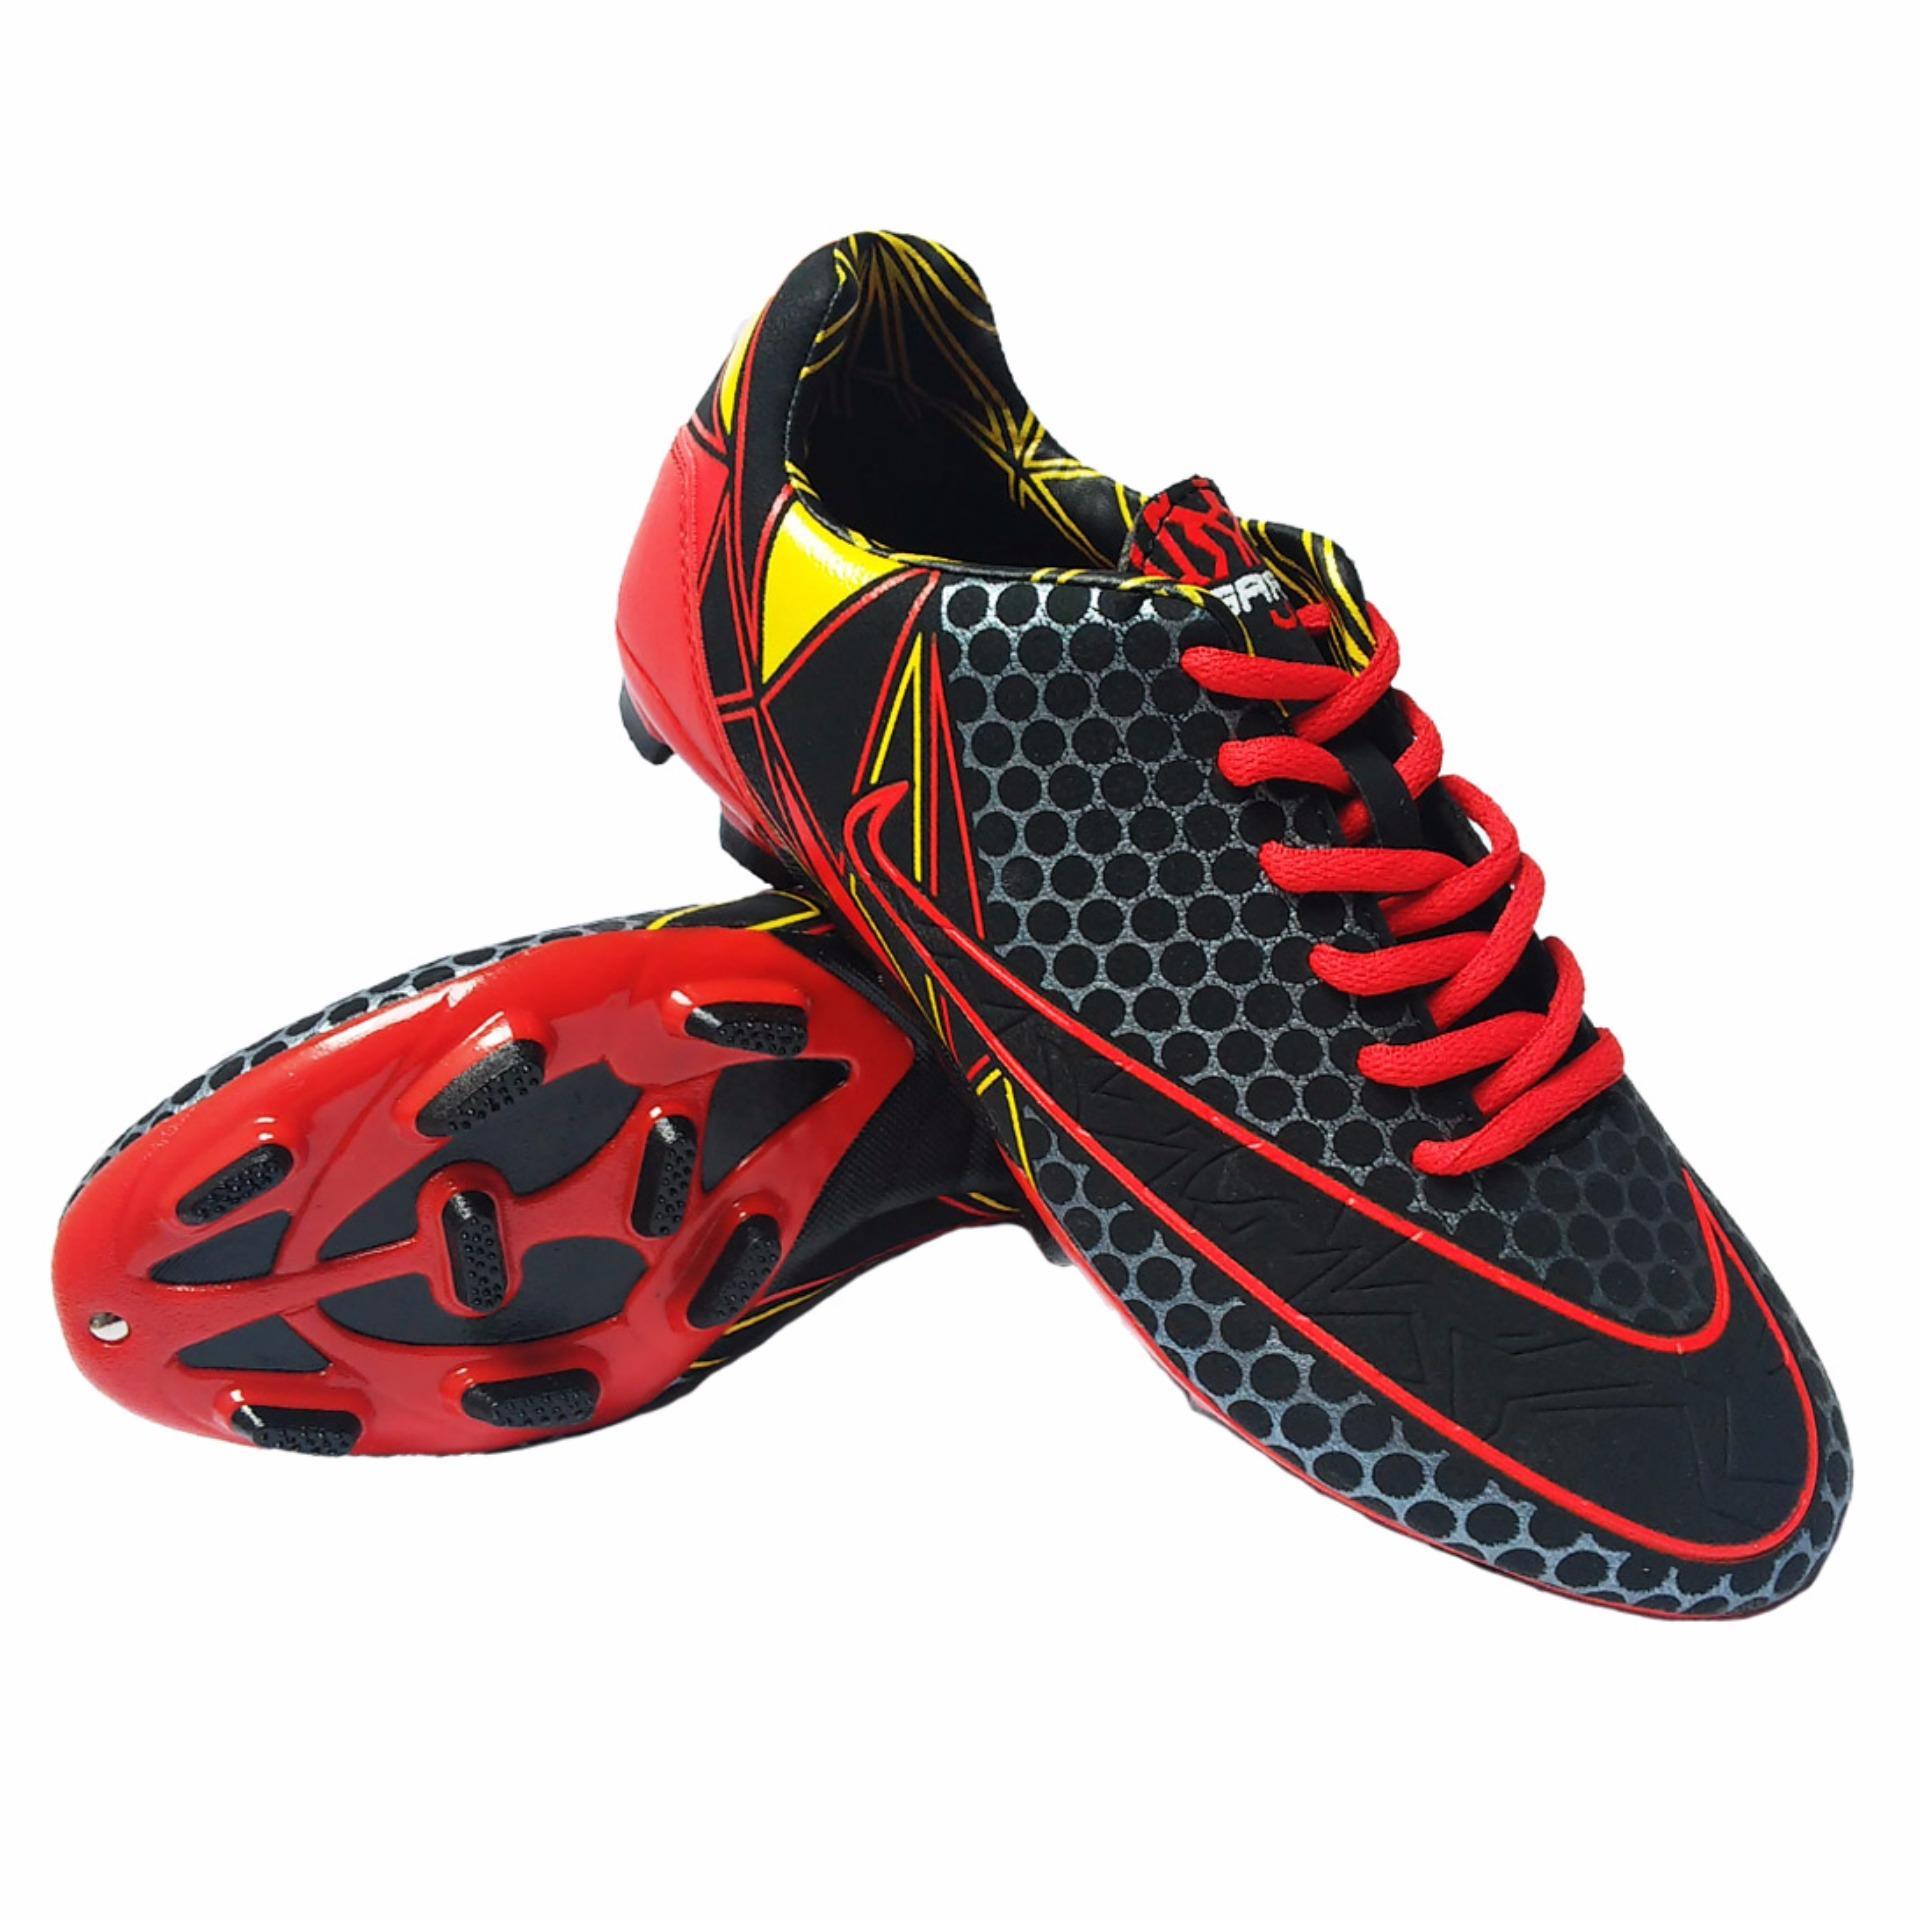 Ogardo Maradona Soccer Sepatu Sepak Bola Pria Merah Lazada Indonesia . 1545058082